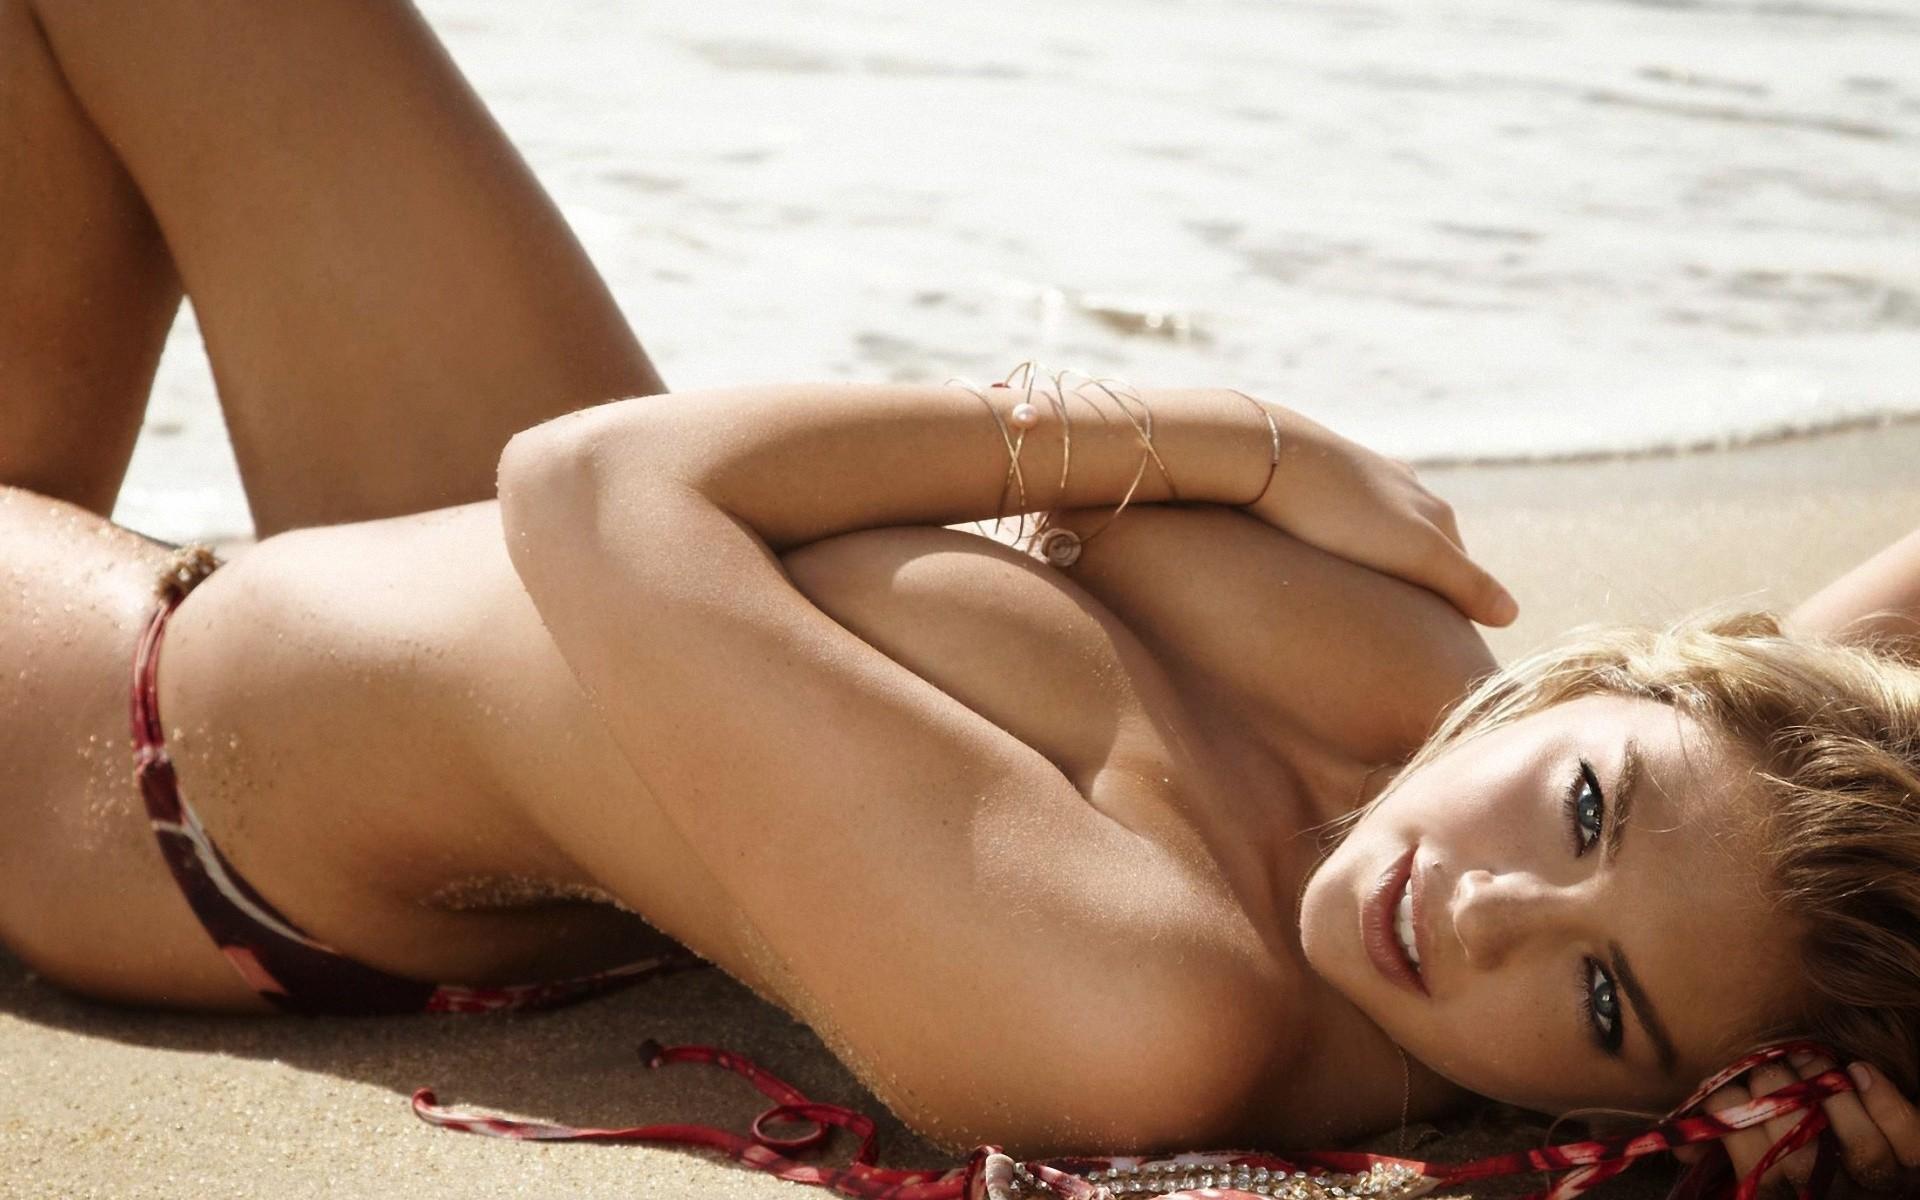 Kate Upton topless sur la plage